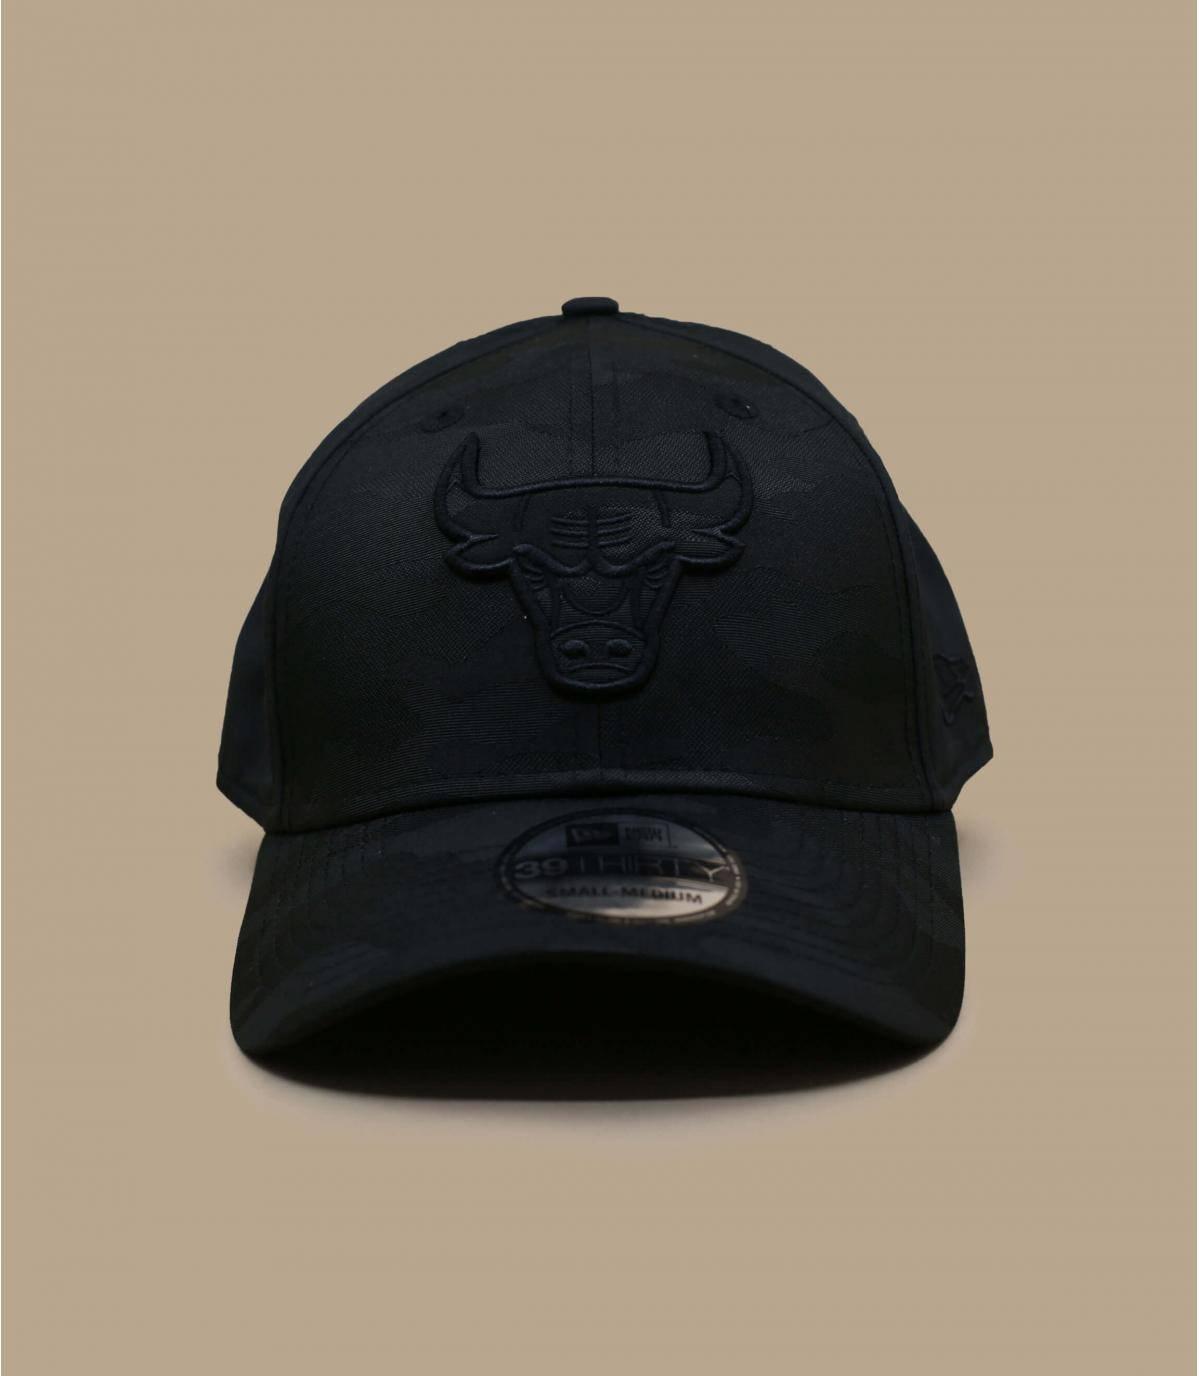 casquette Bulls noir camo